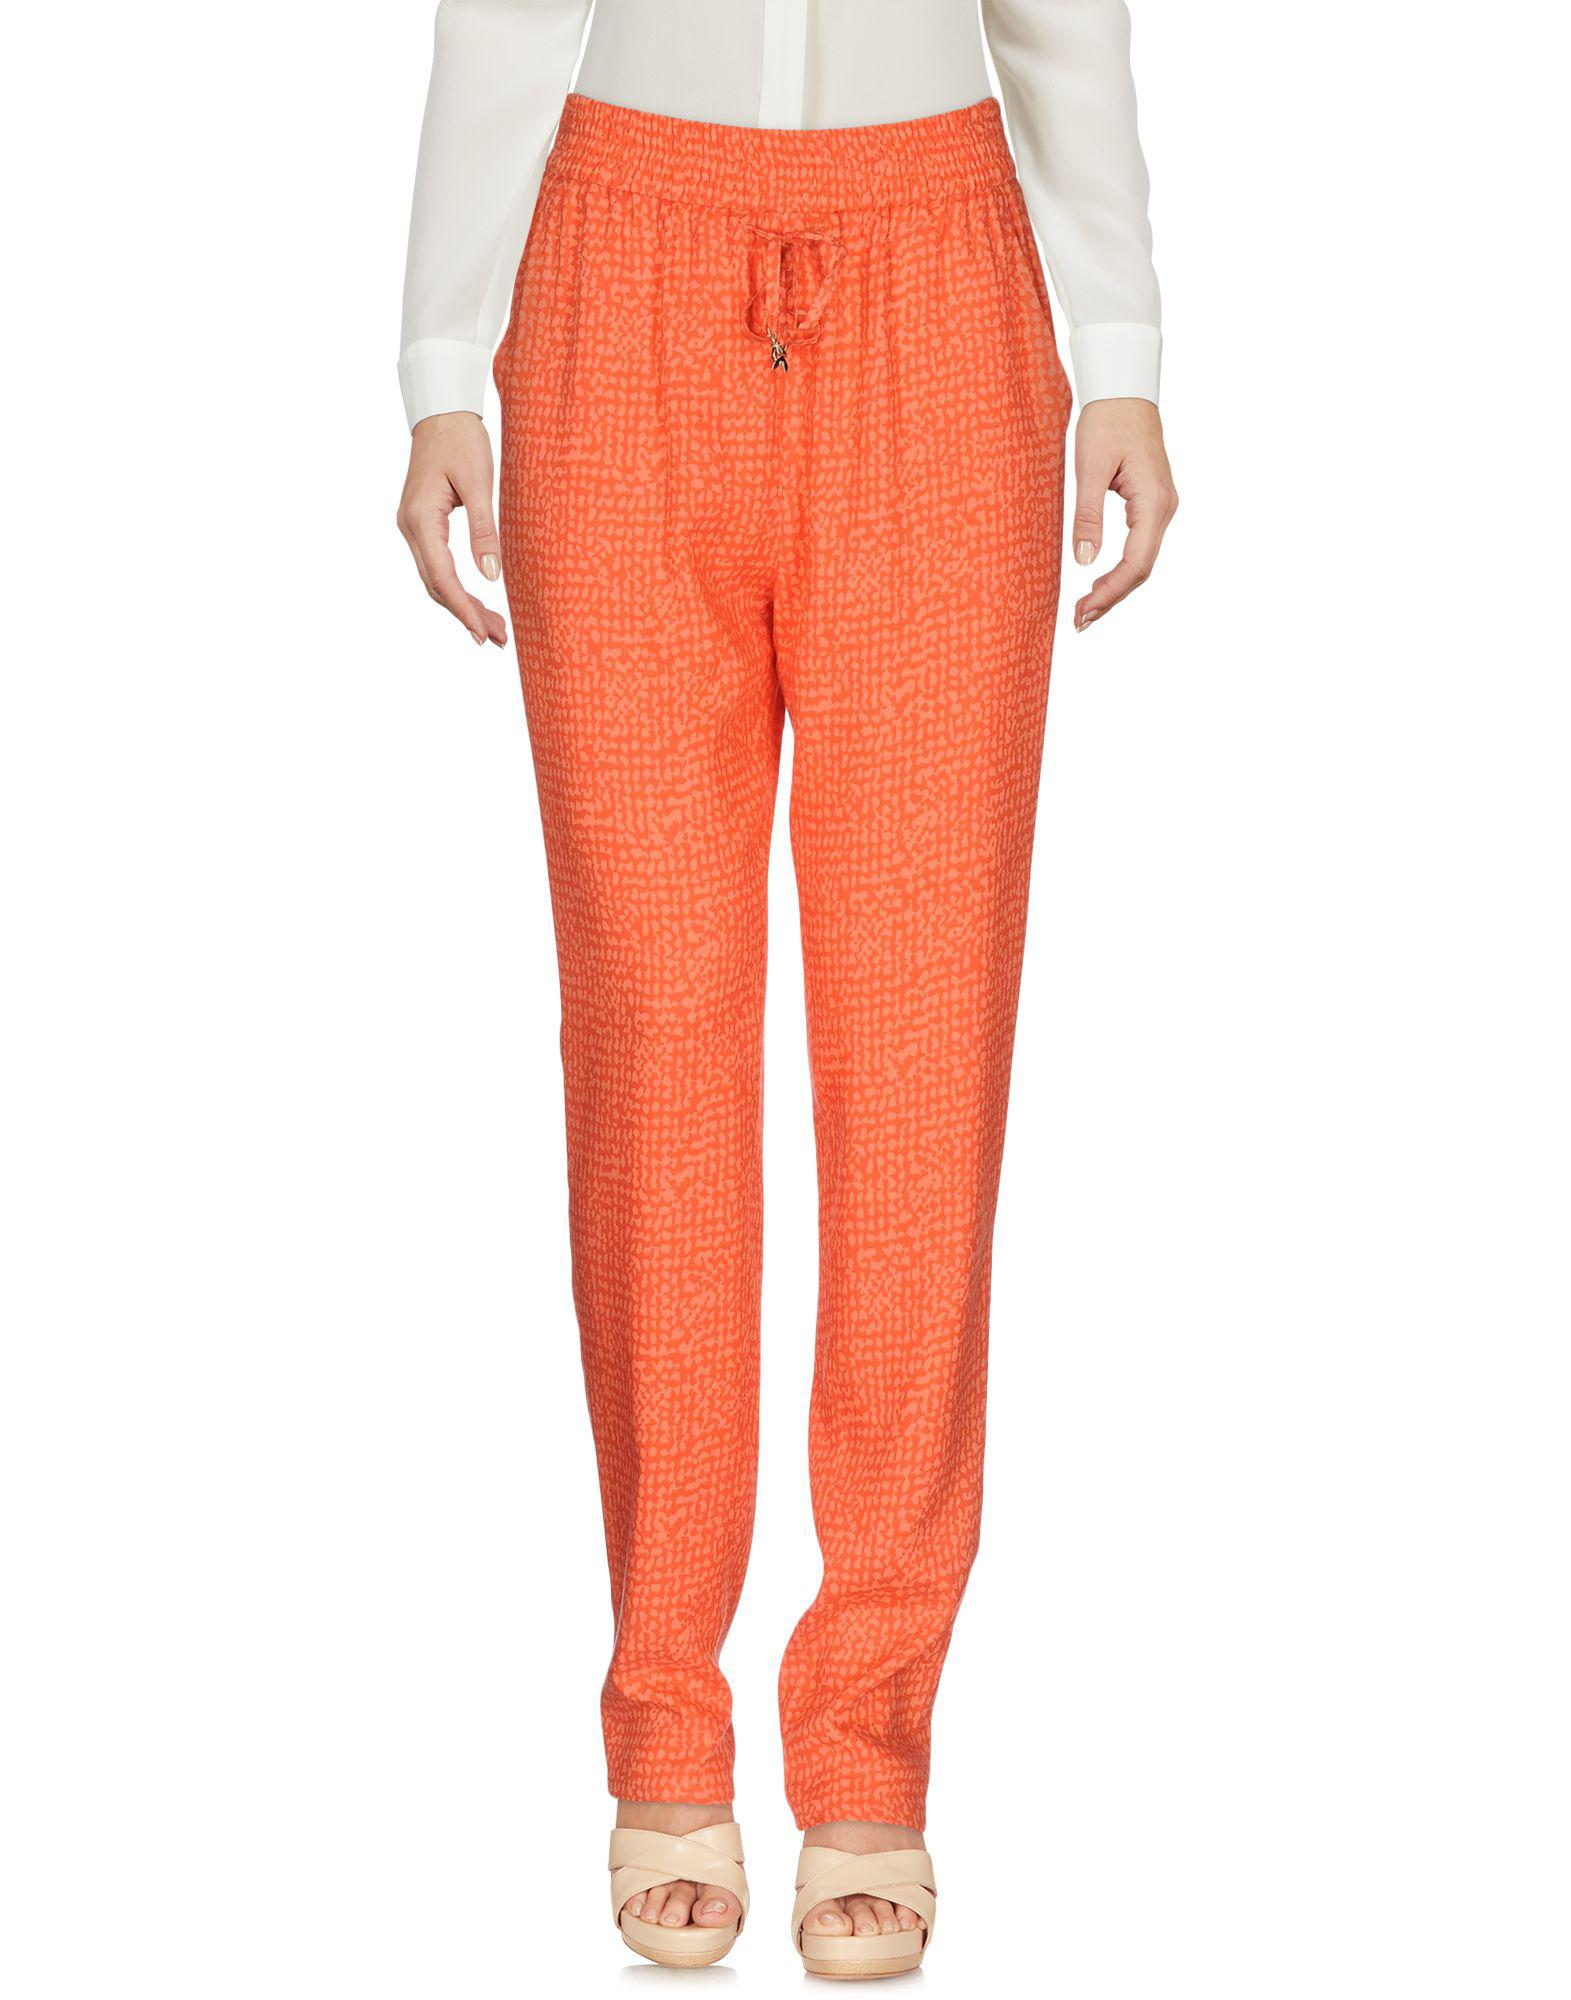 4365b1c0d3e70 Lyst - Patrizia Pepe Hose in Orange